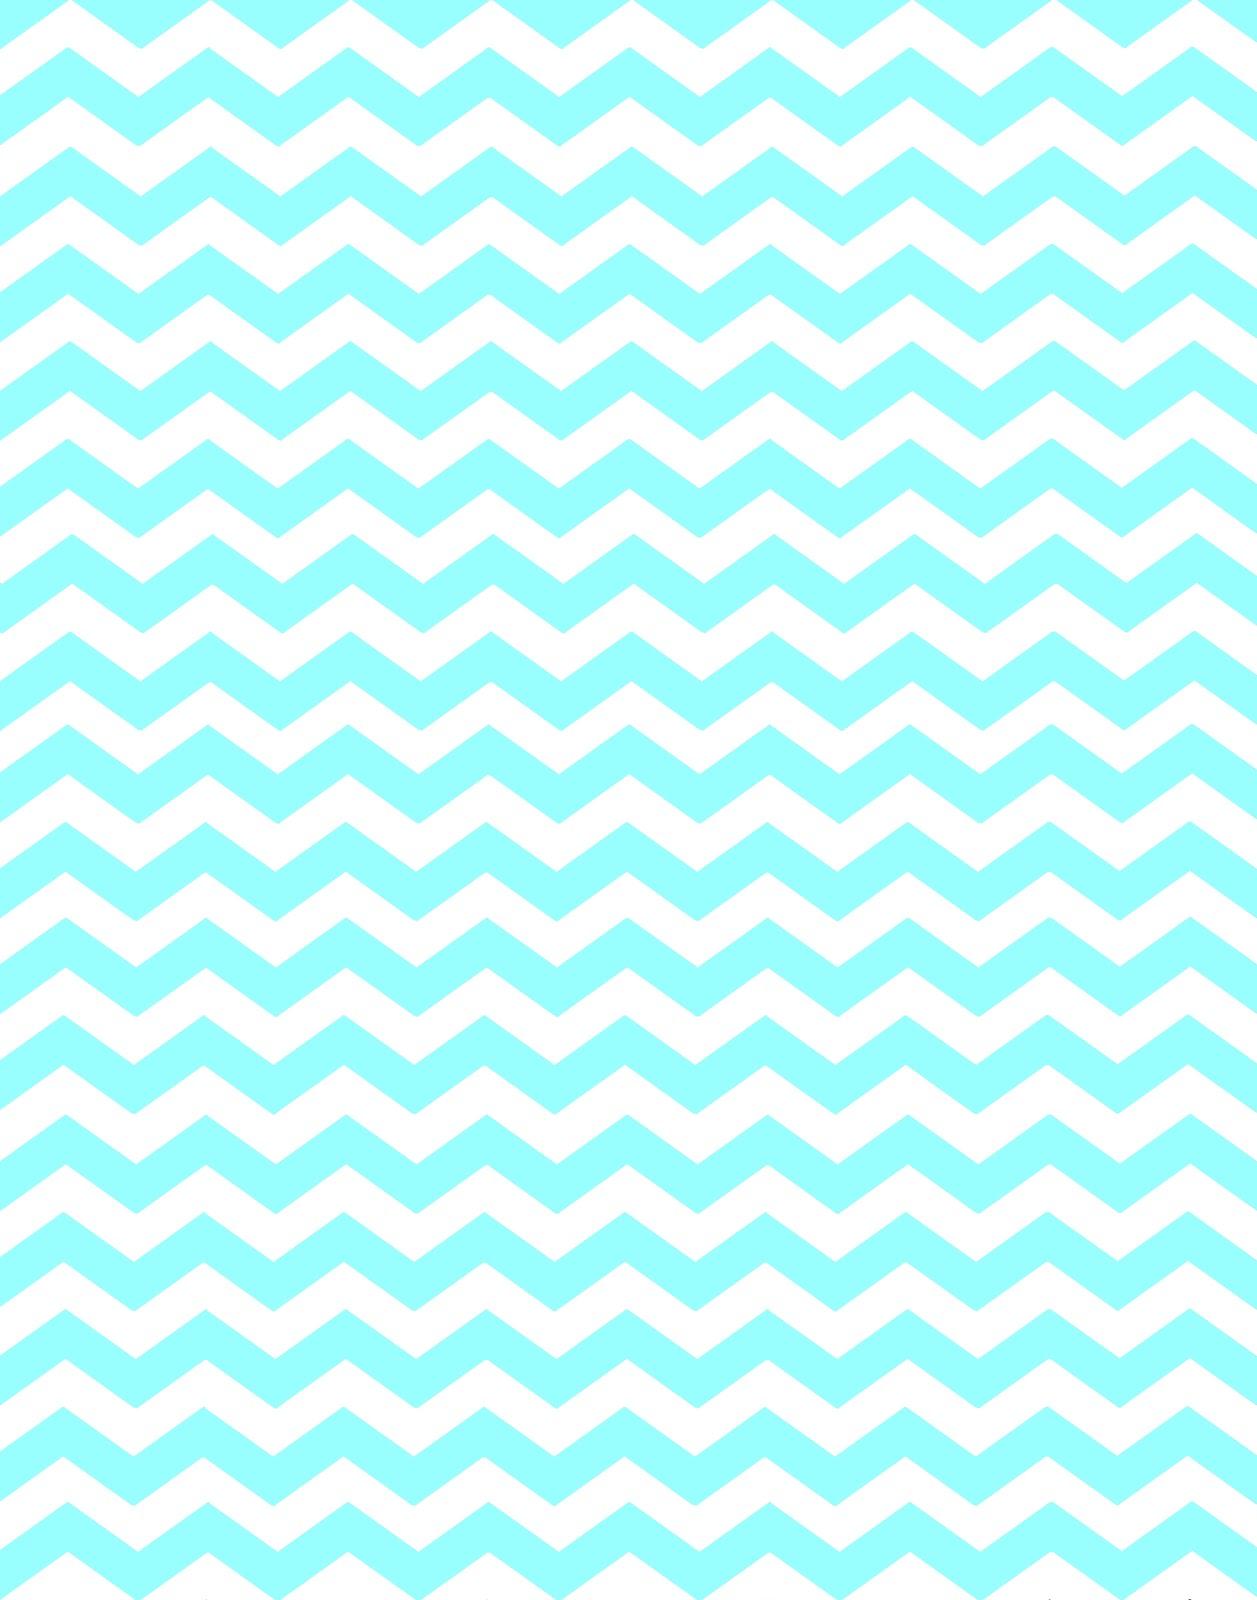 turquoise chevron wallpaper - photo #9